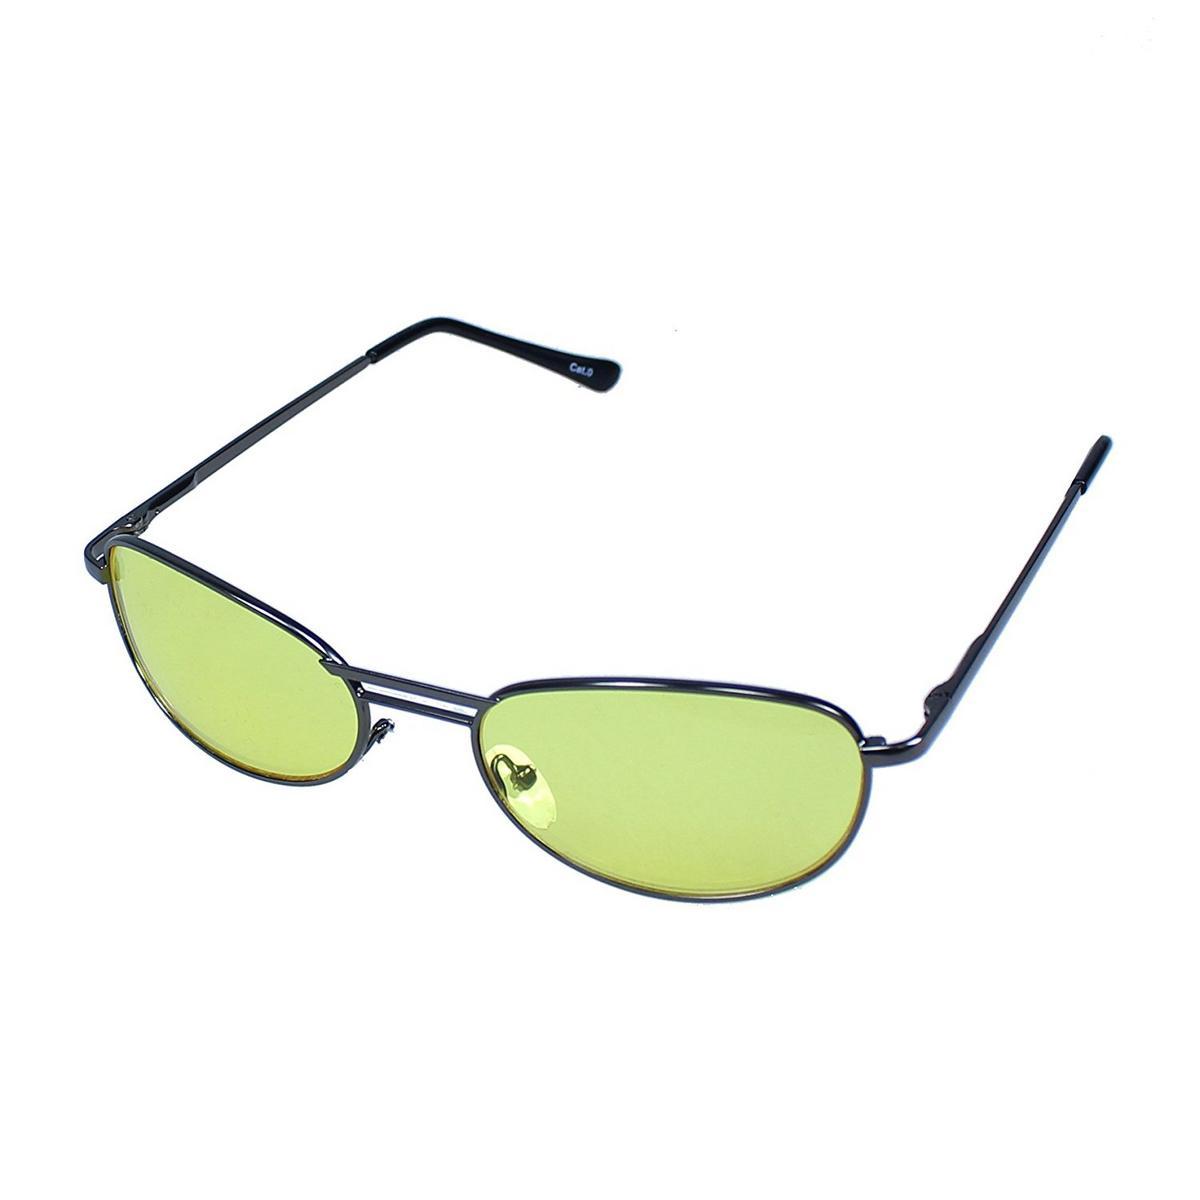 Lifetime Vision EX95712 Unisex Night Driving Vision Glasses Single